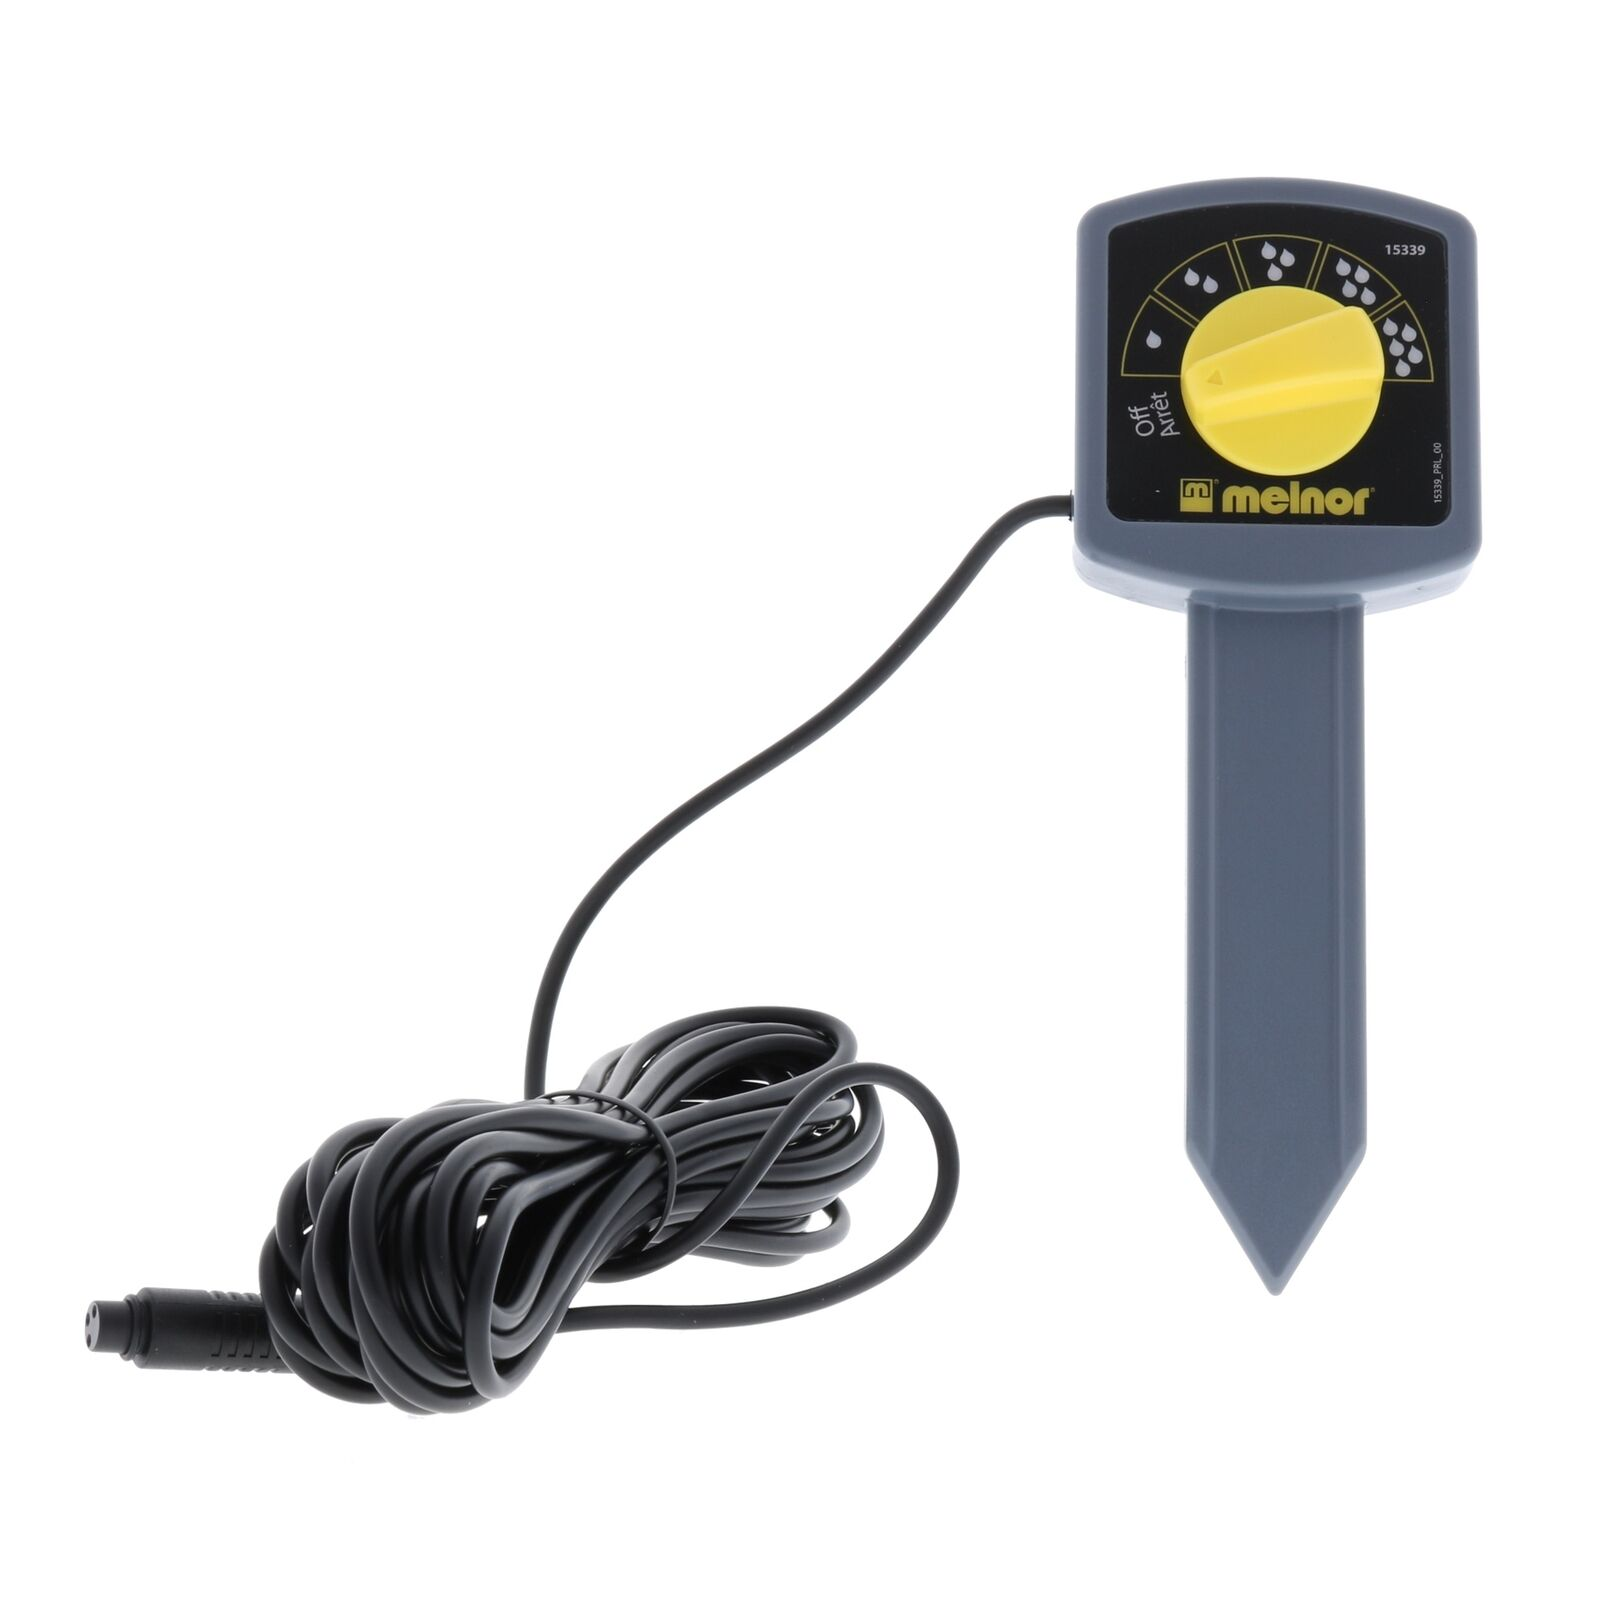 Hydrologic Wired Soil Moisture Sensor